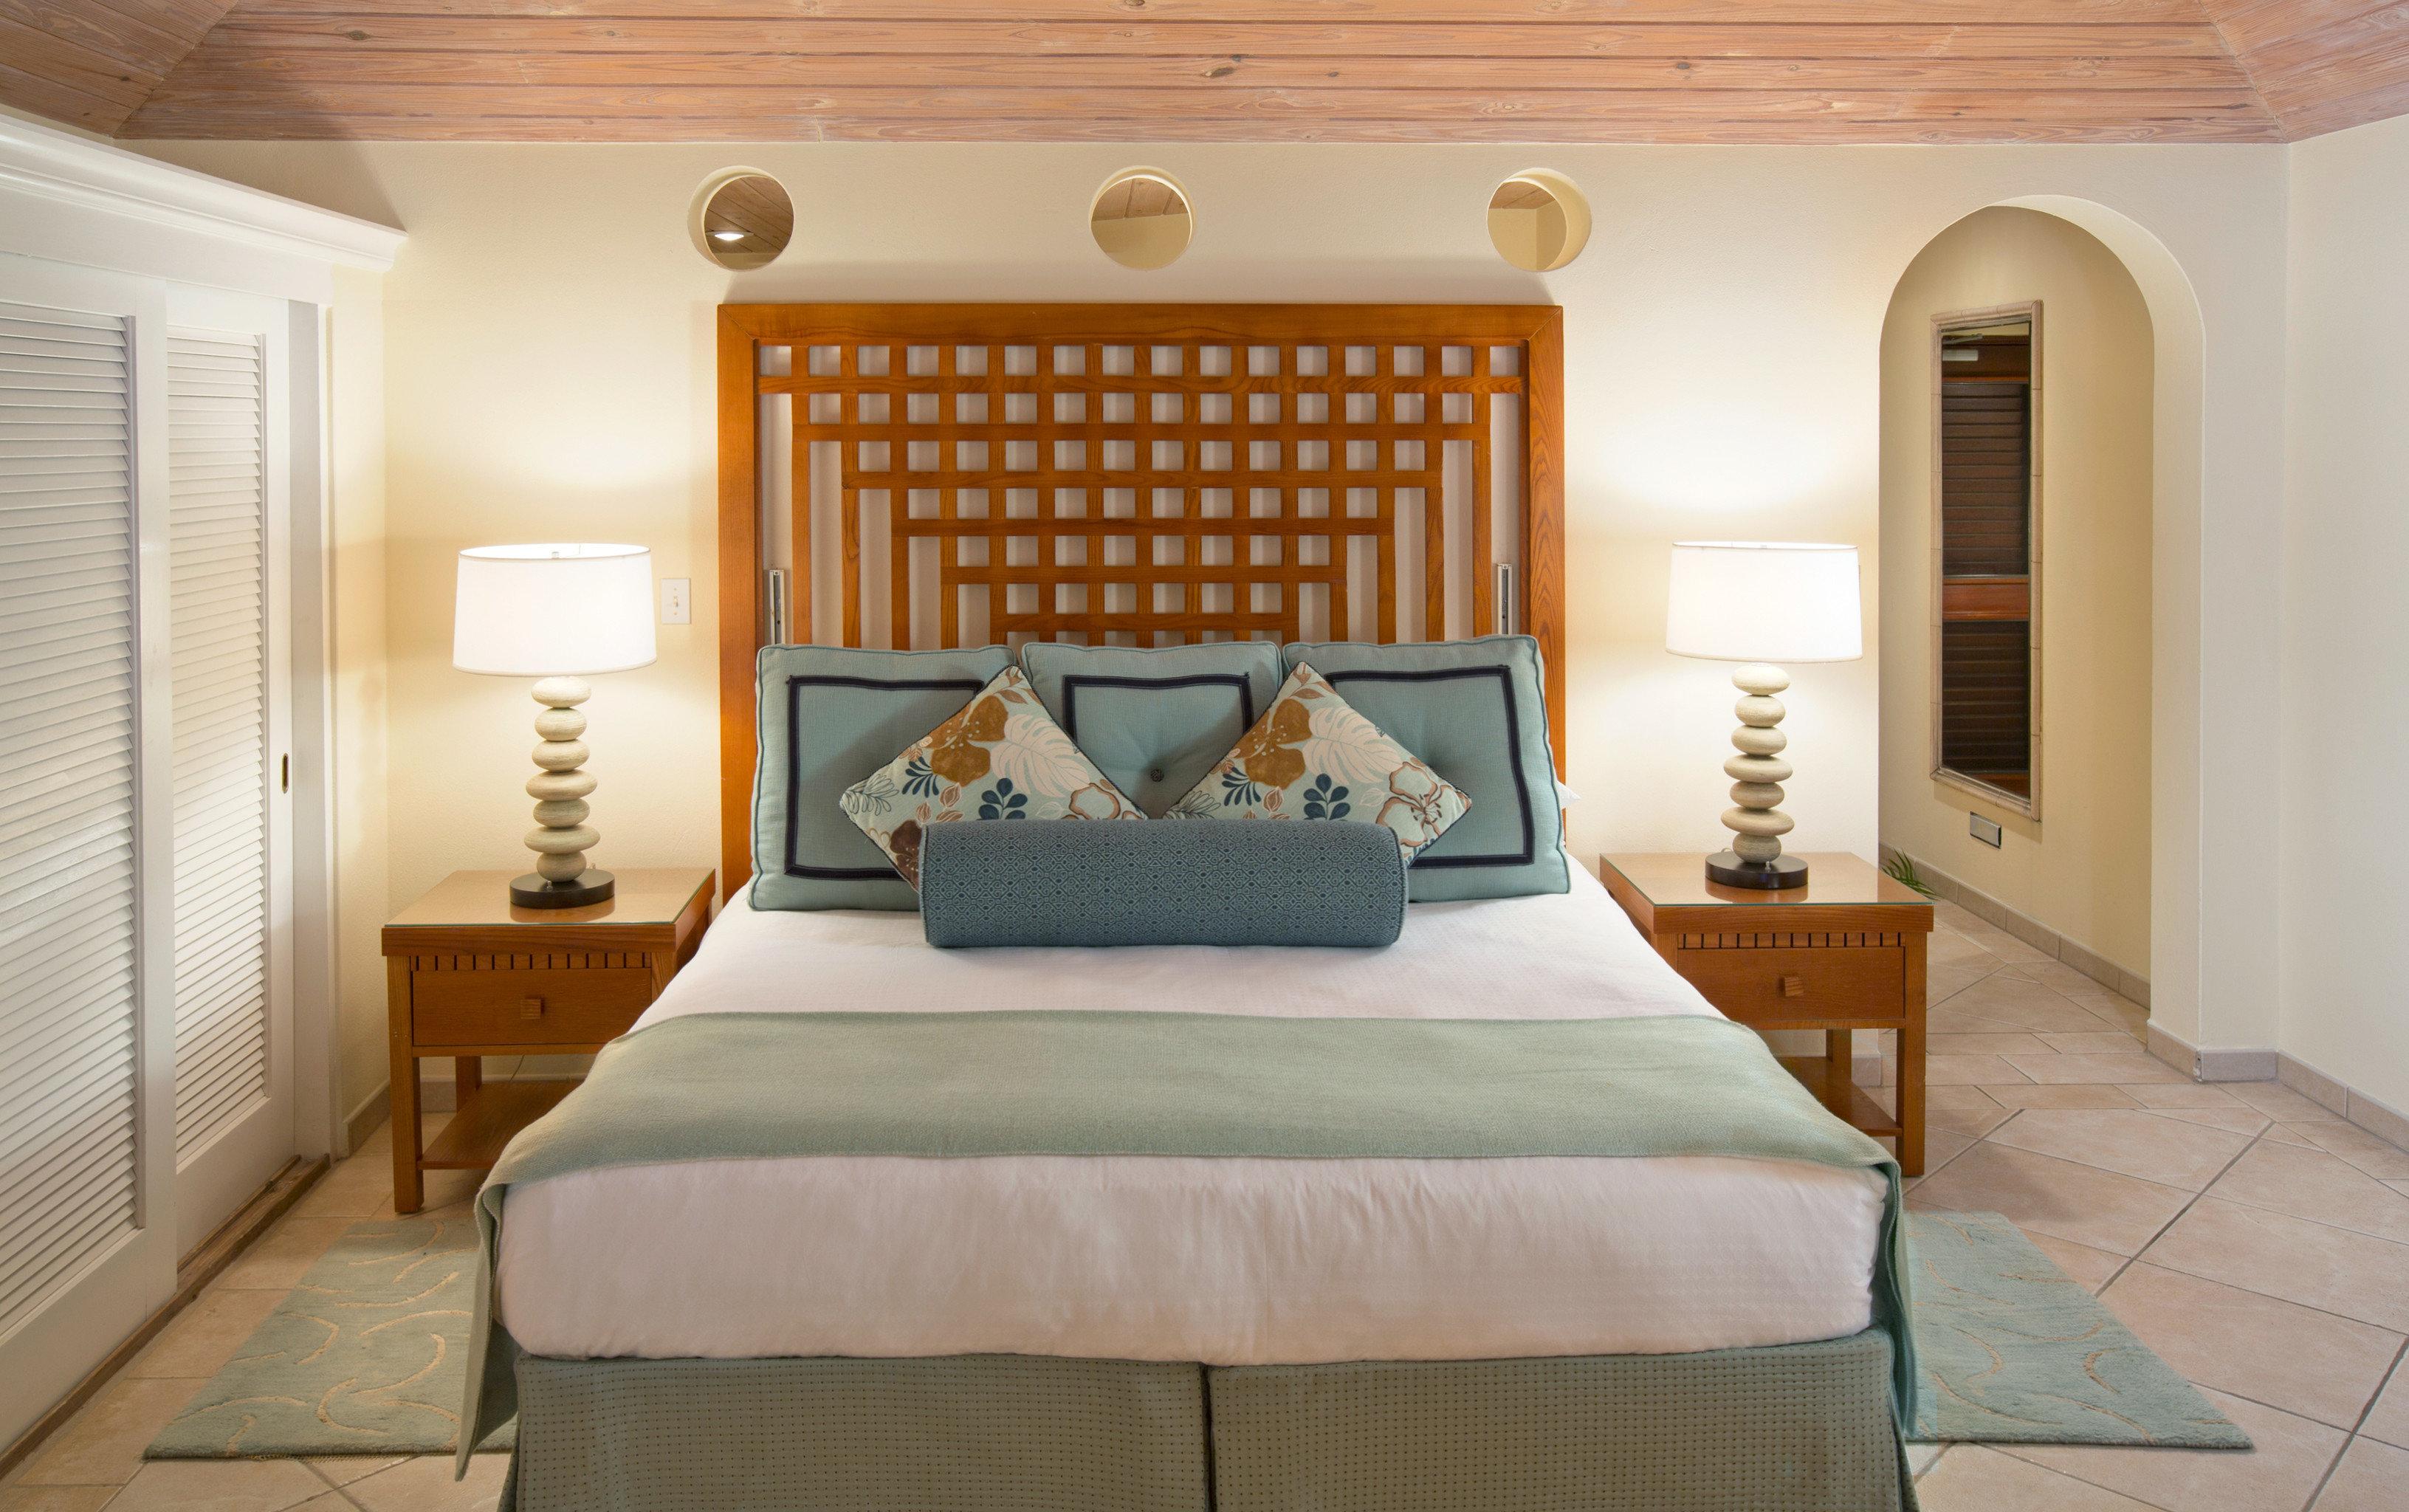 Beachfront Bedroom Honeymoon Island Resort Romance Romantic Suite Tropical property cottage home